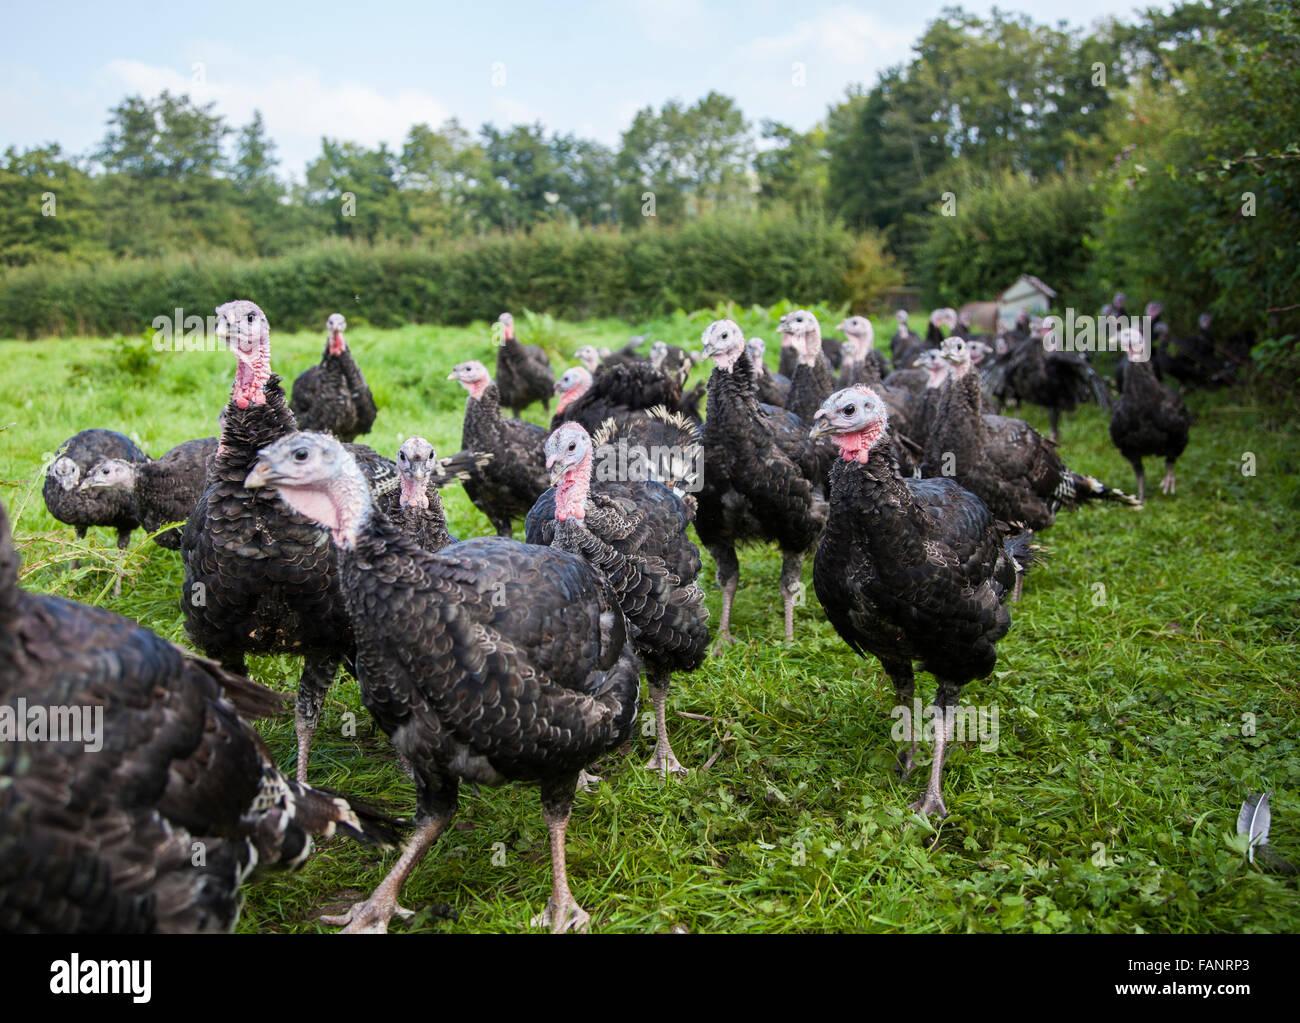 Turkeys in a field on an organic turkey farm a few months before Christmas Stock Photo